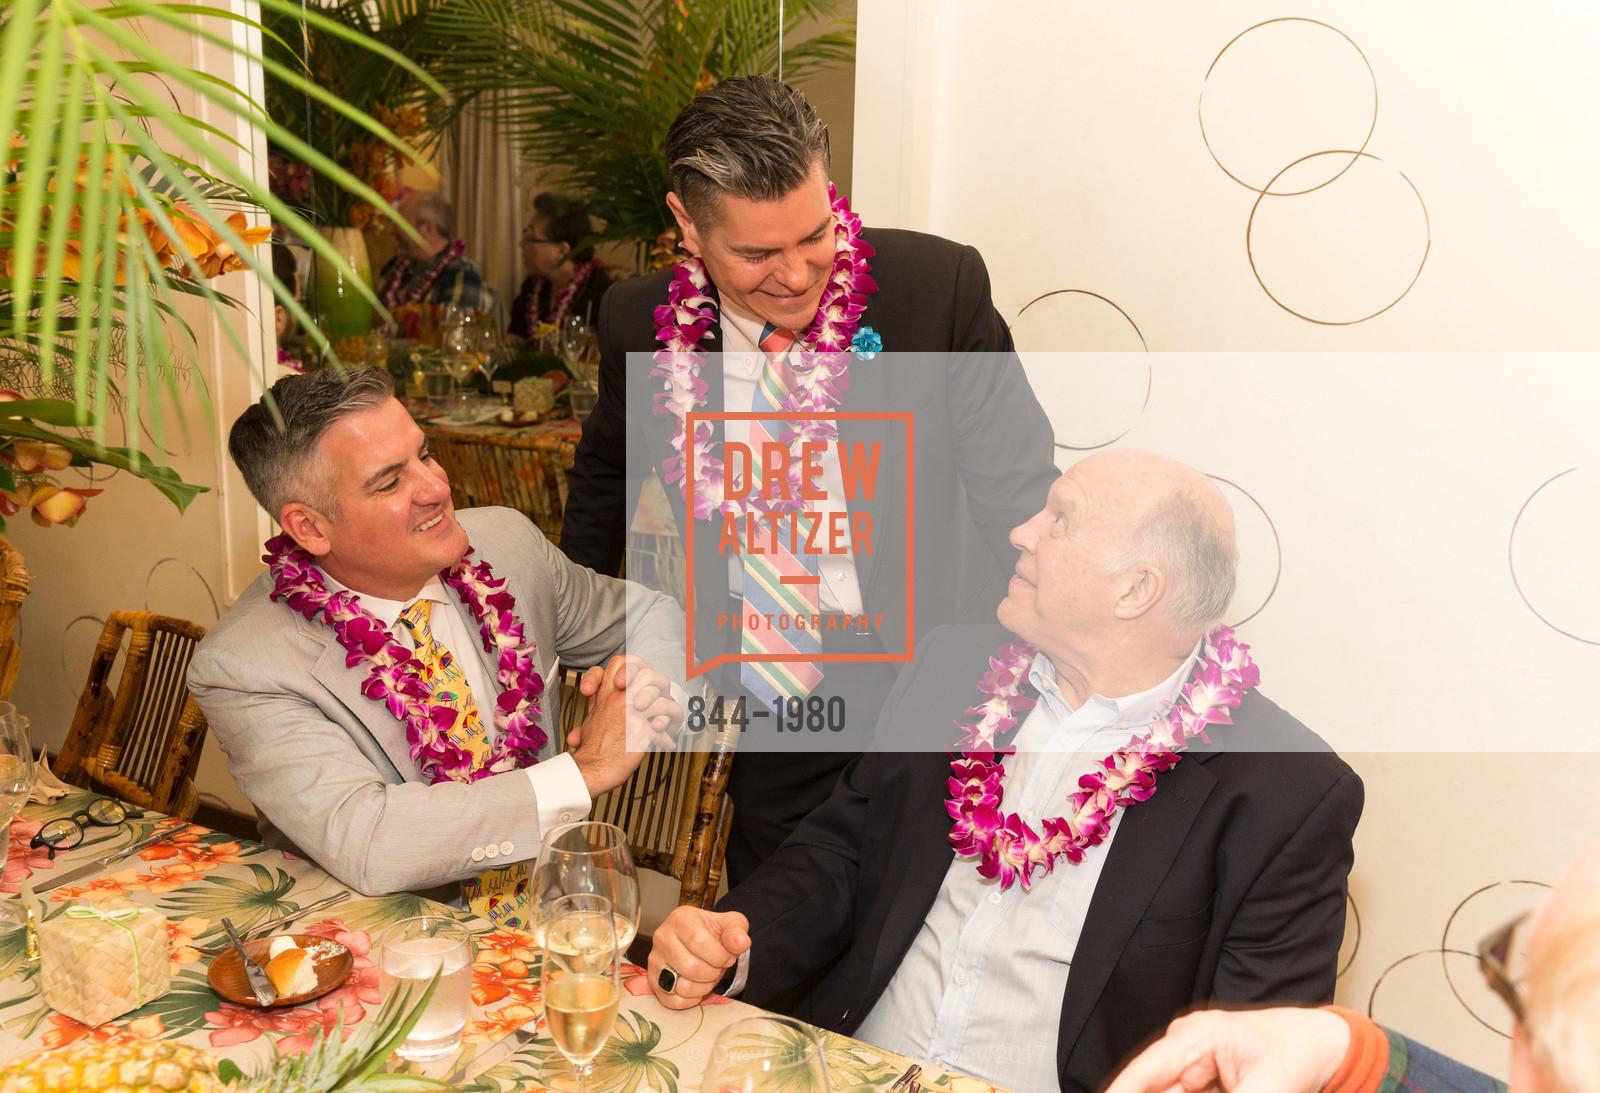 Tim Graffigna, Chris Meza, Bill Hales, Aubrey Brewster's Purely Paradise Birthday Luncheon 2017, Neiman Marcus. 150 Stockton St  SF, California 94108, March 24th, 2017